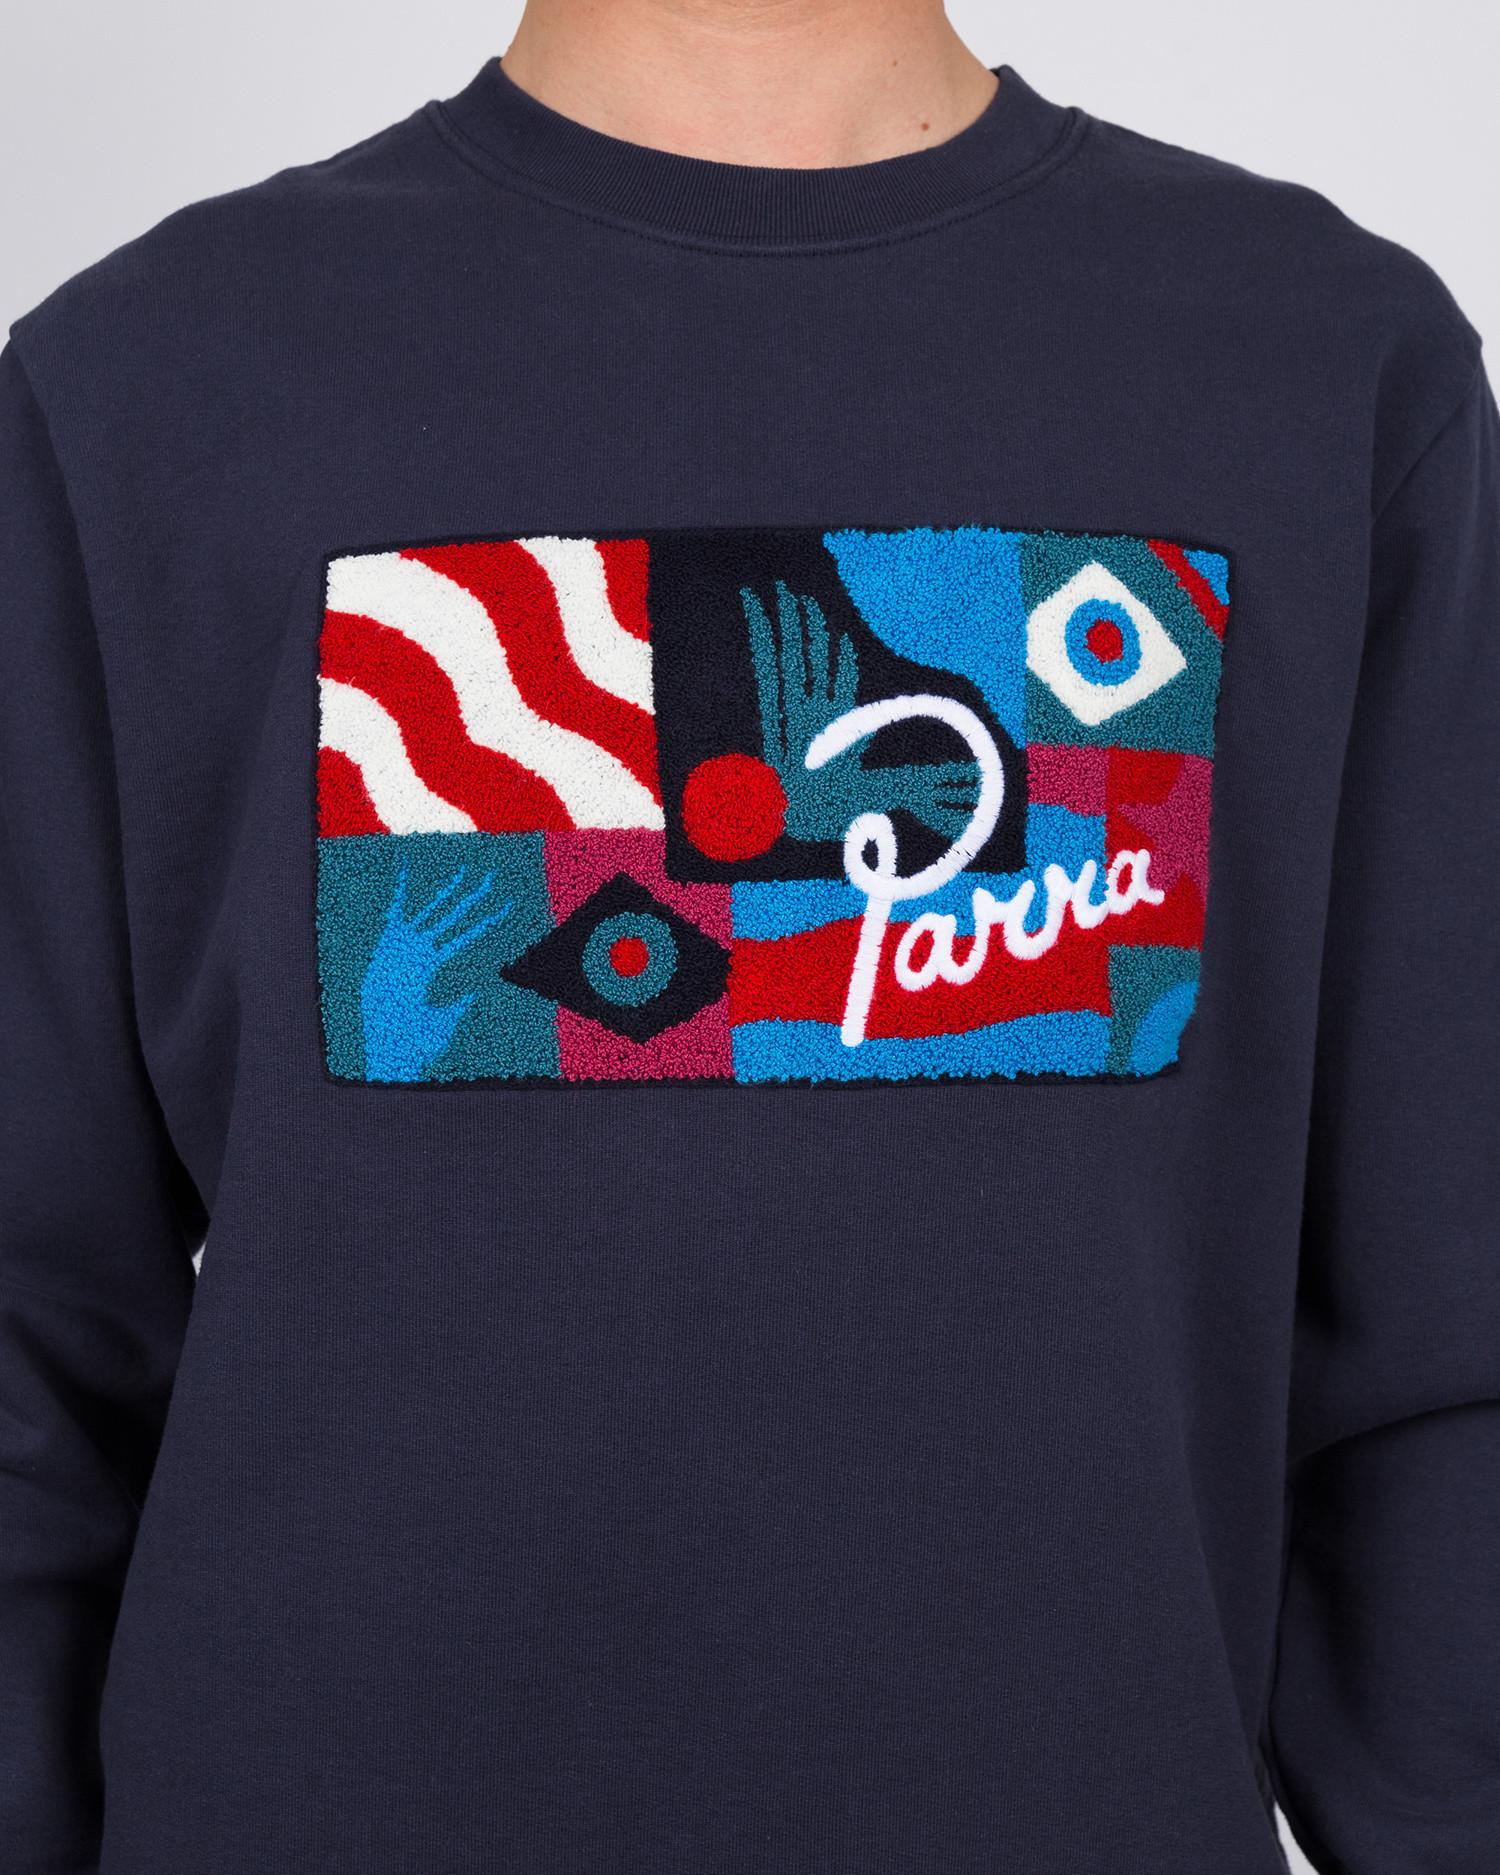 Parra grab the flag crewneck sweater navy blue